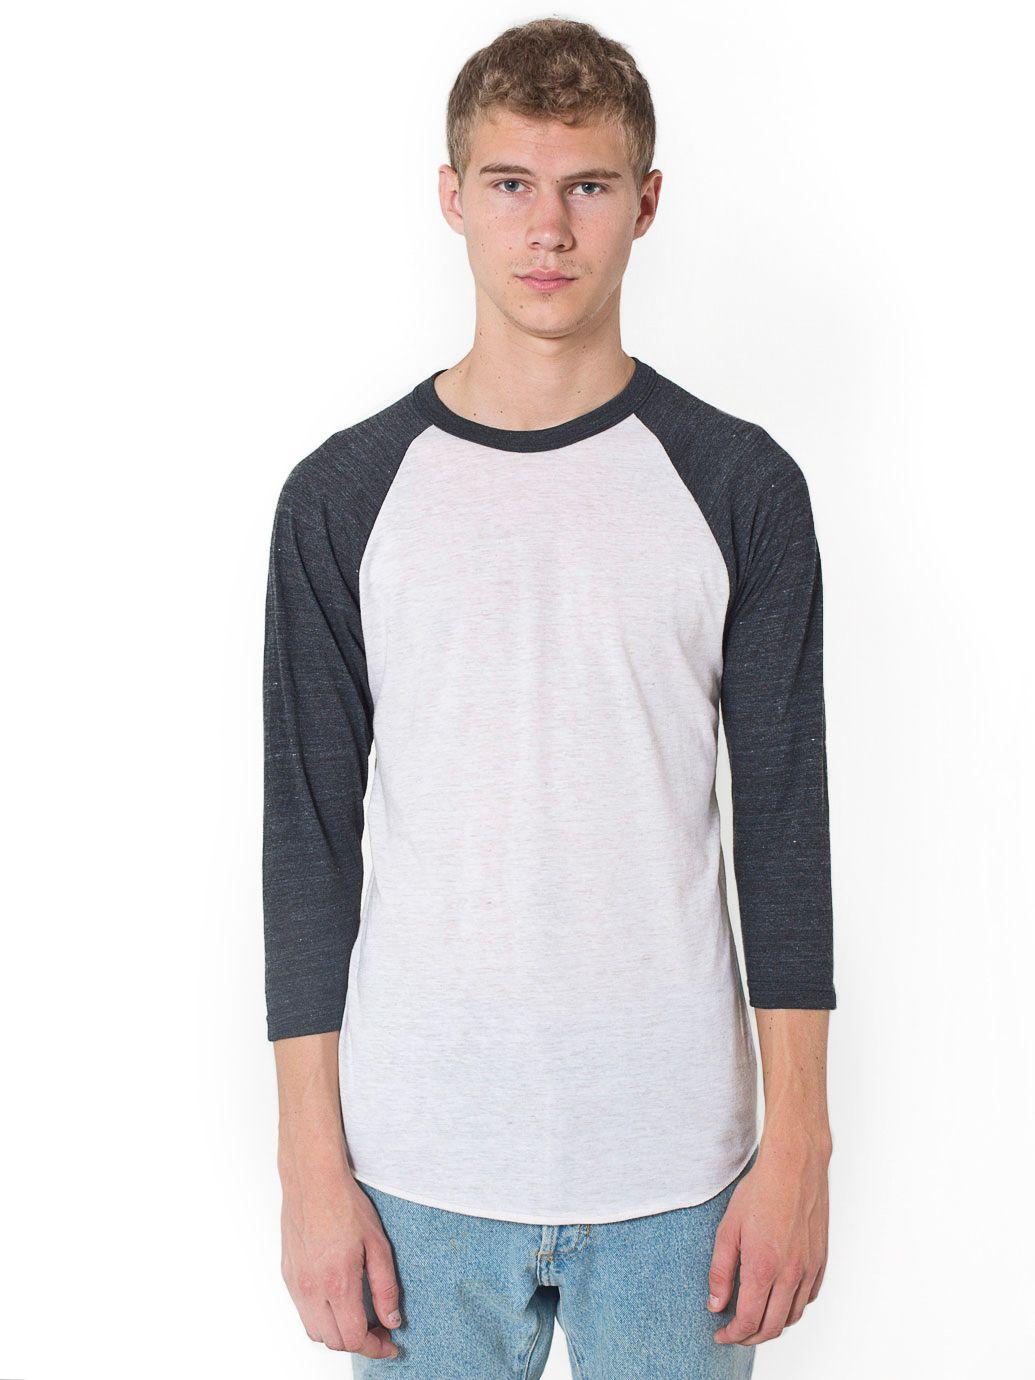 Shirt @ American apparel